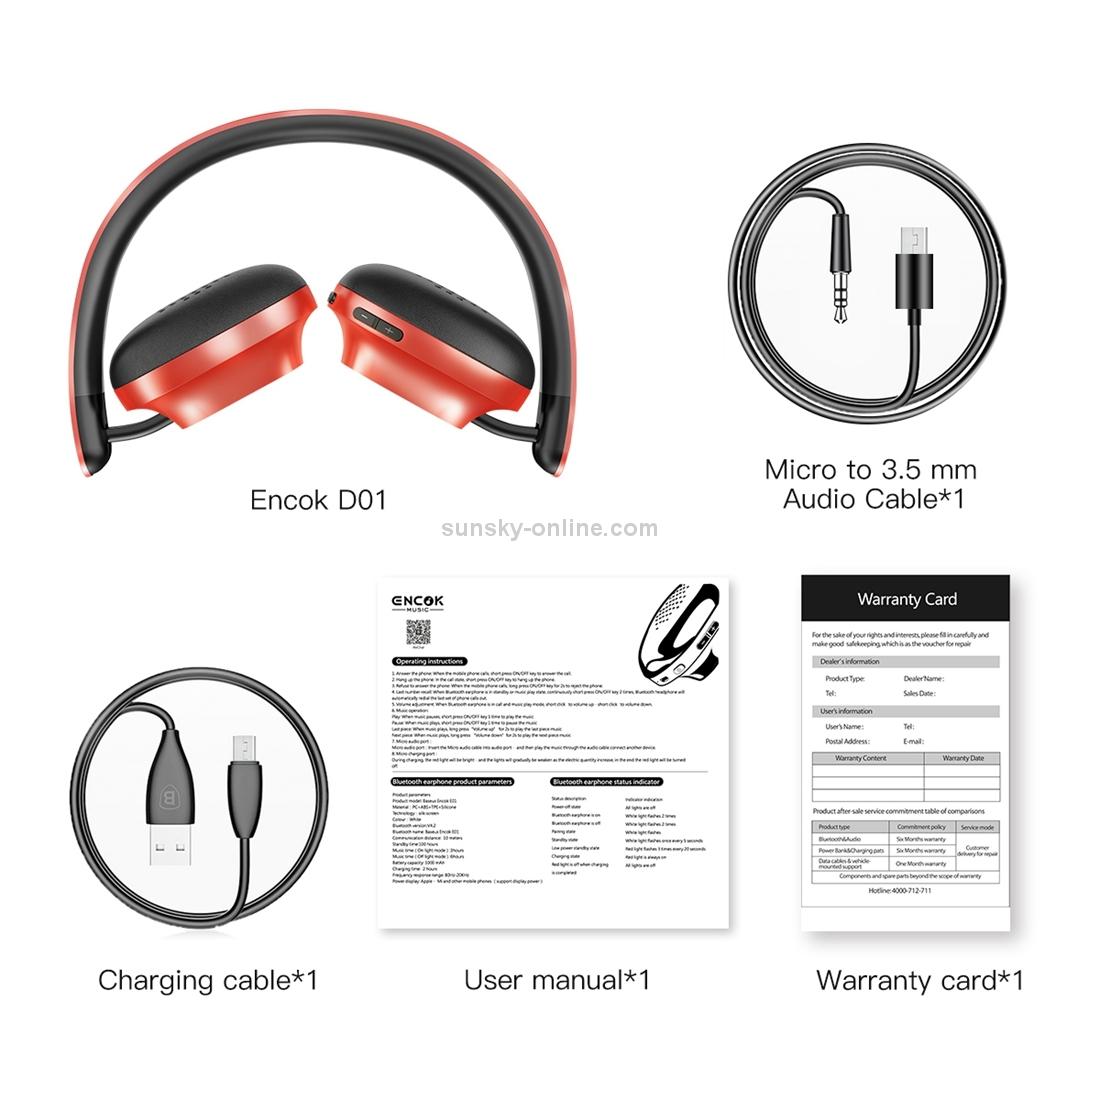 SUNSKY - Baseus Encok D01 Headband Bluetooth / wired